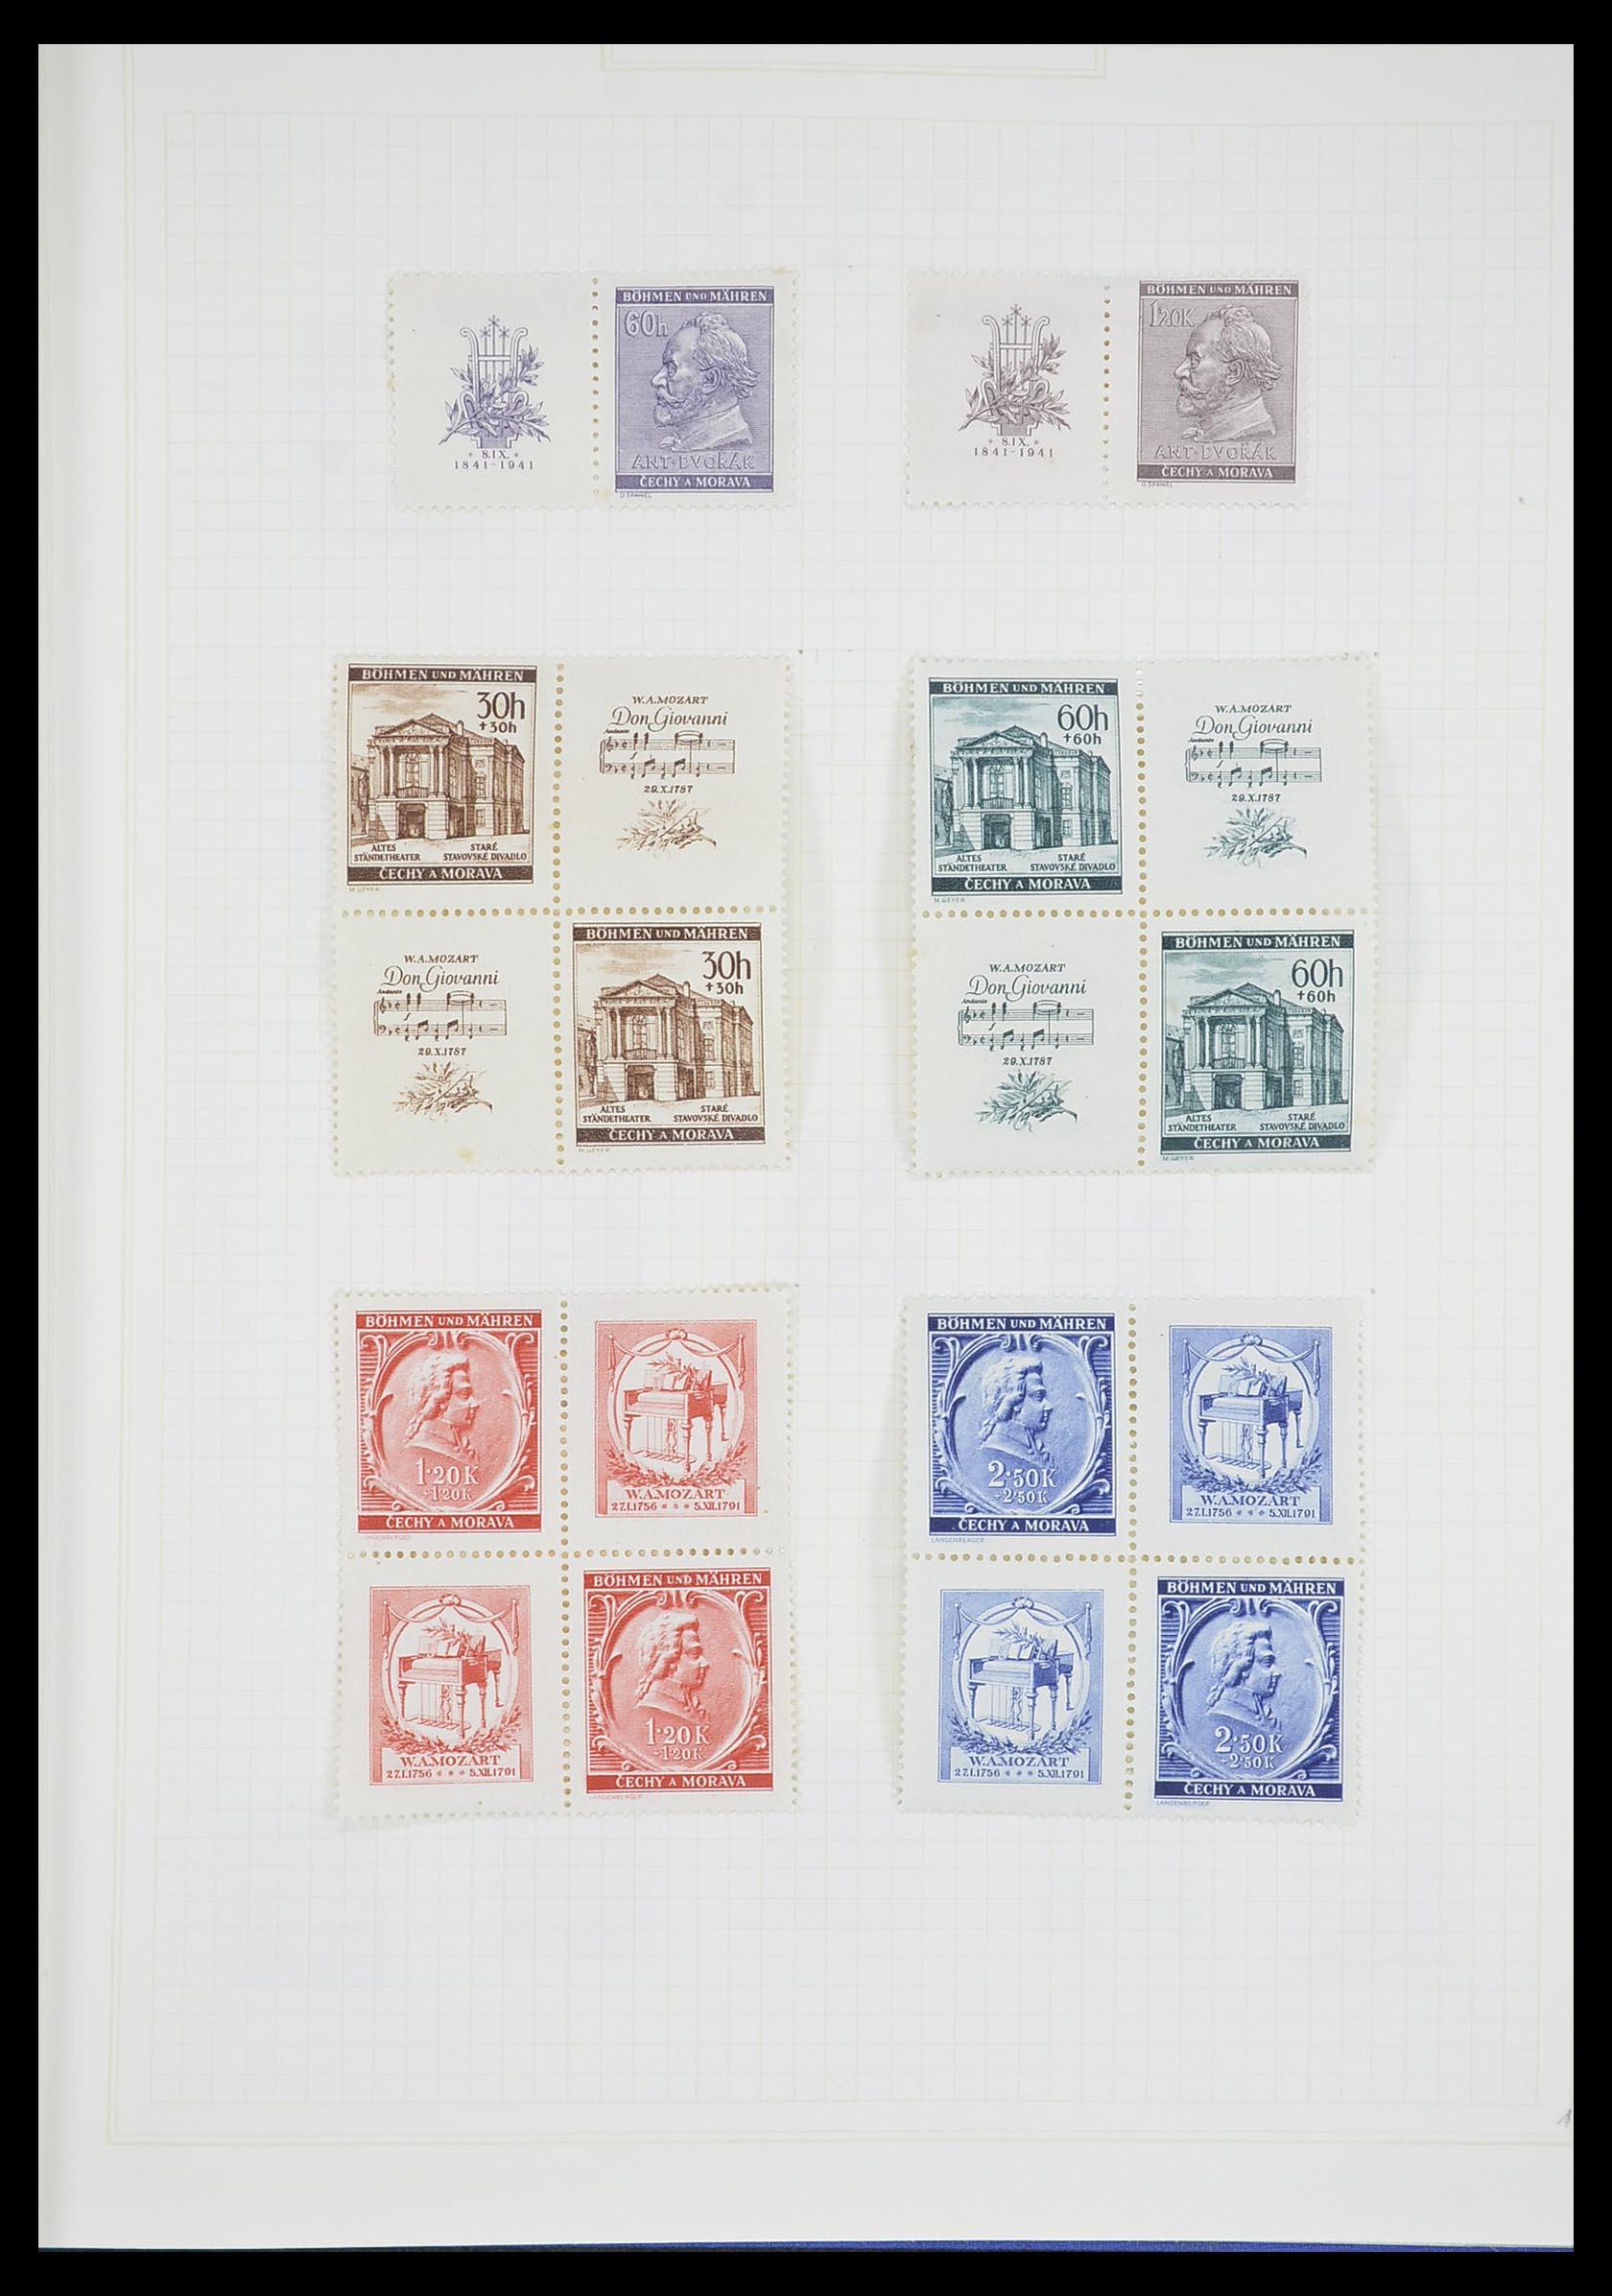 33713 016 - Postzegelverzameling 33713 Duitse bezettingen WO I en WO II 1914-1945